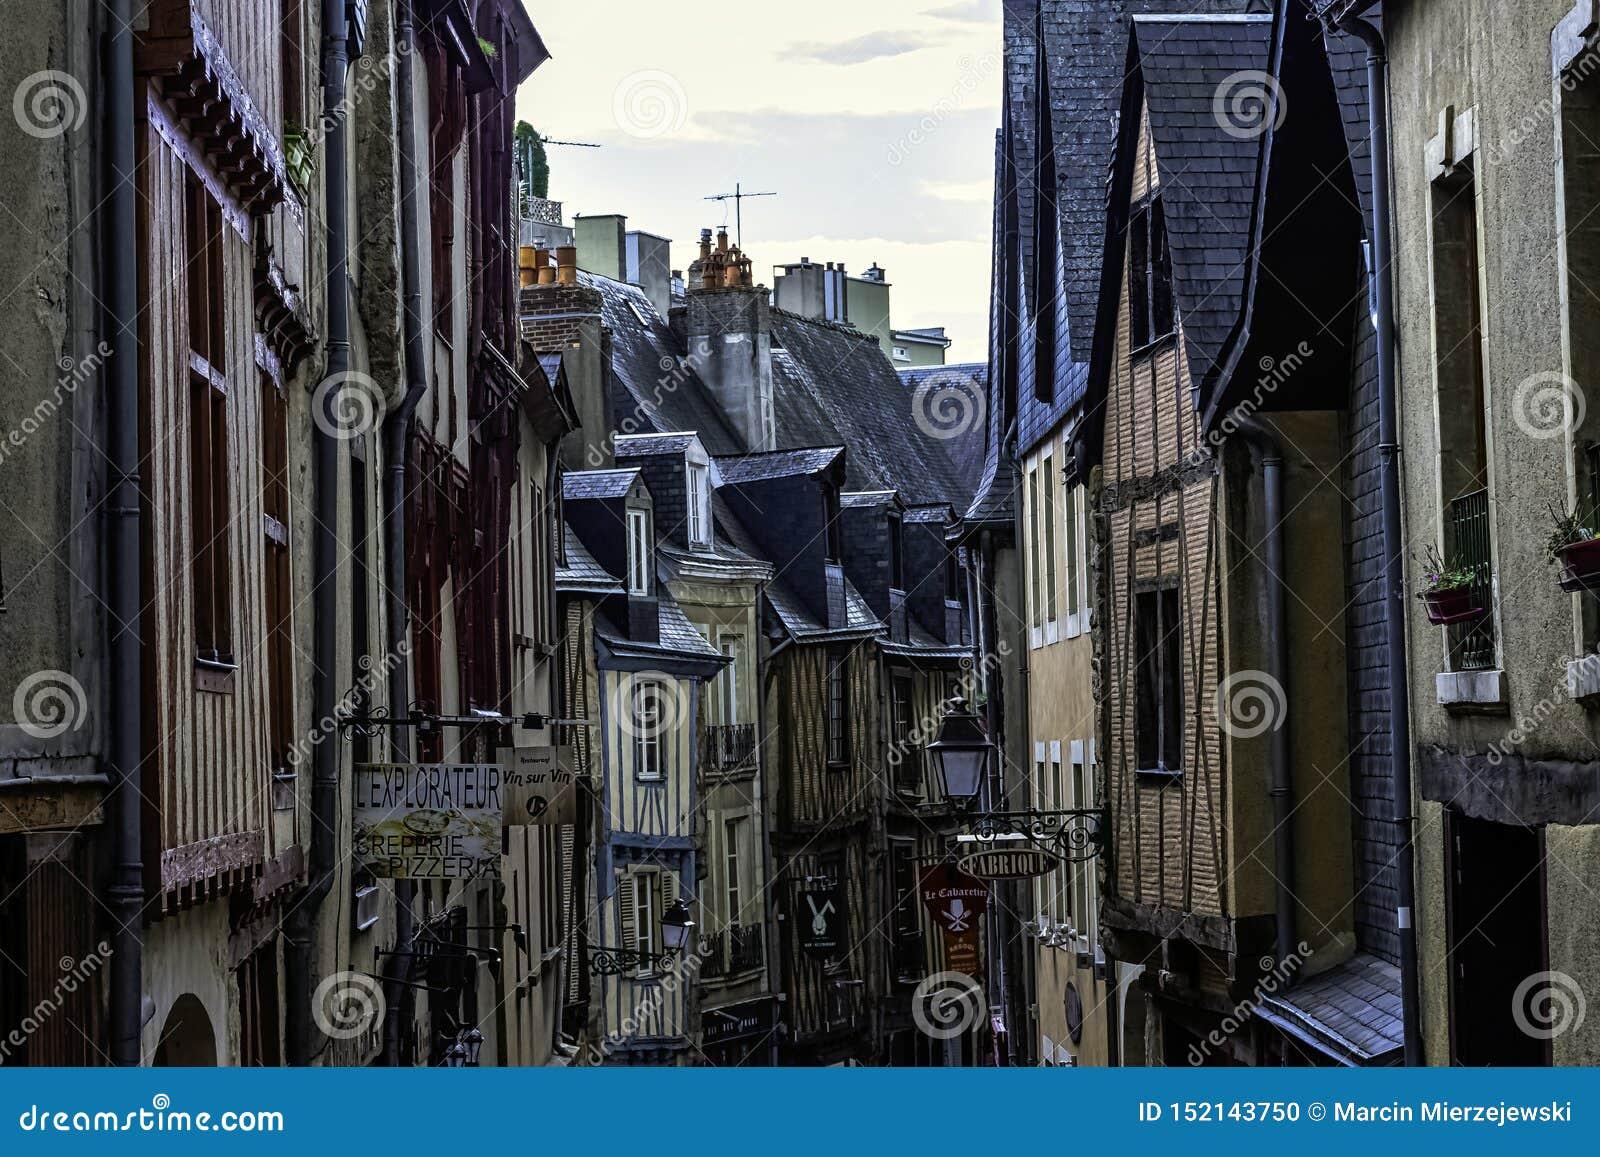 Architecte Le Mans street of le mans old town with vintage architecture in le